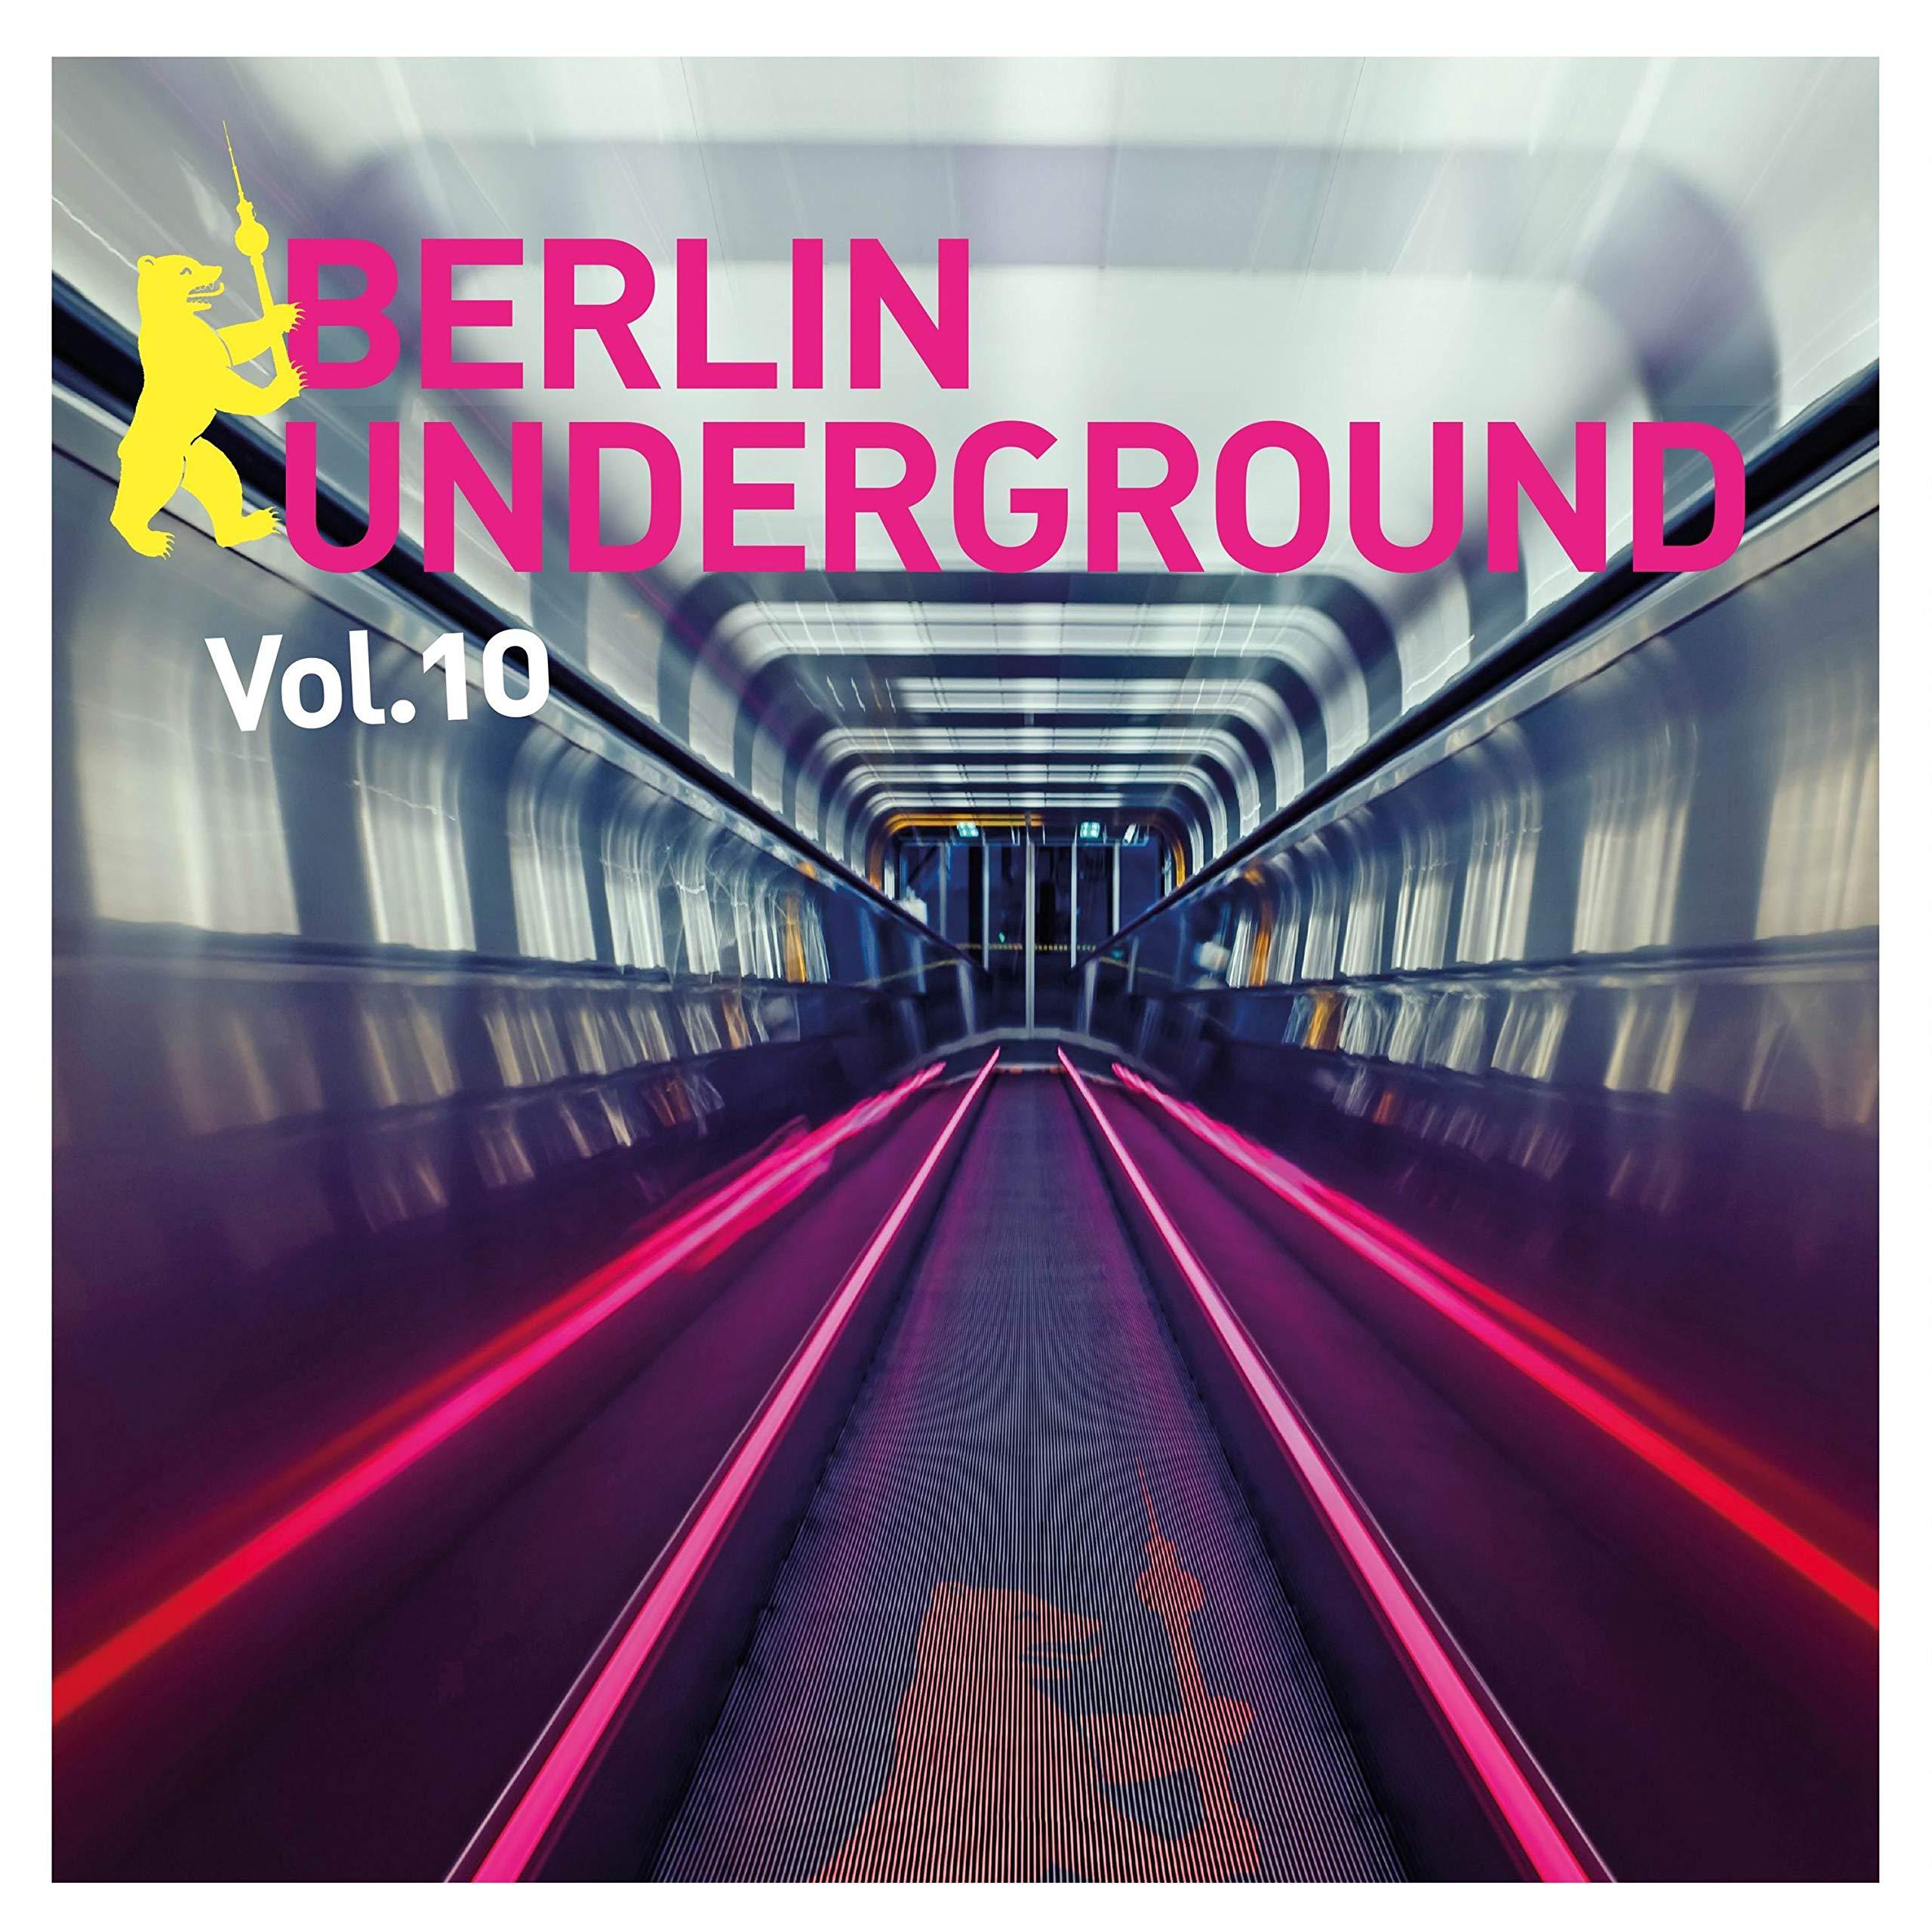 VA – Berlin Underground Vol.10 (2020) [FLAC]